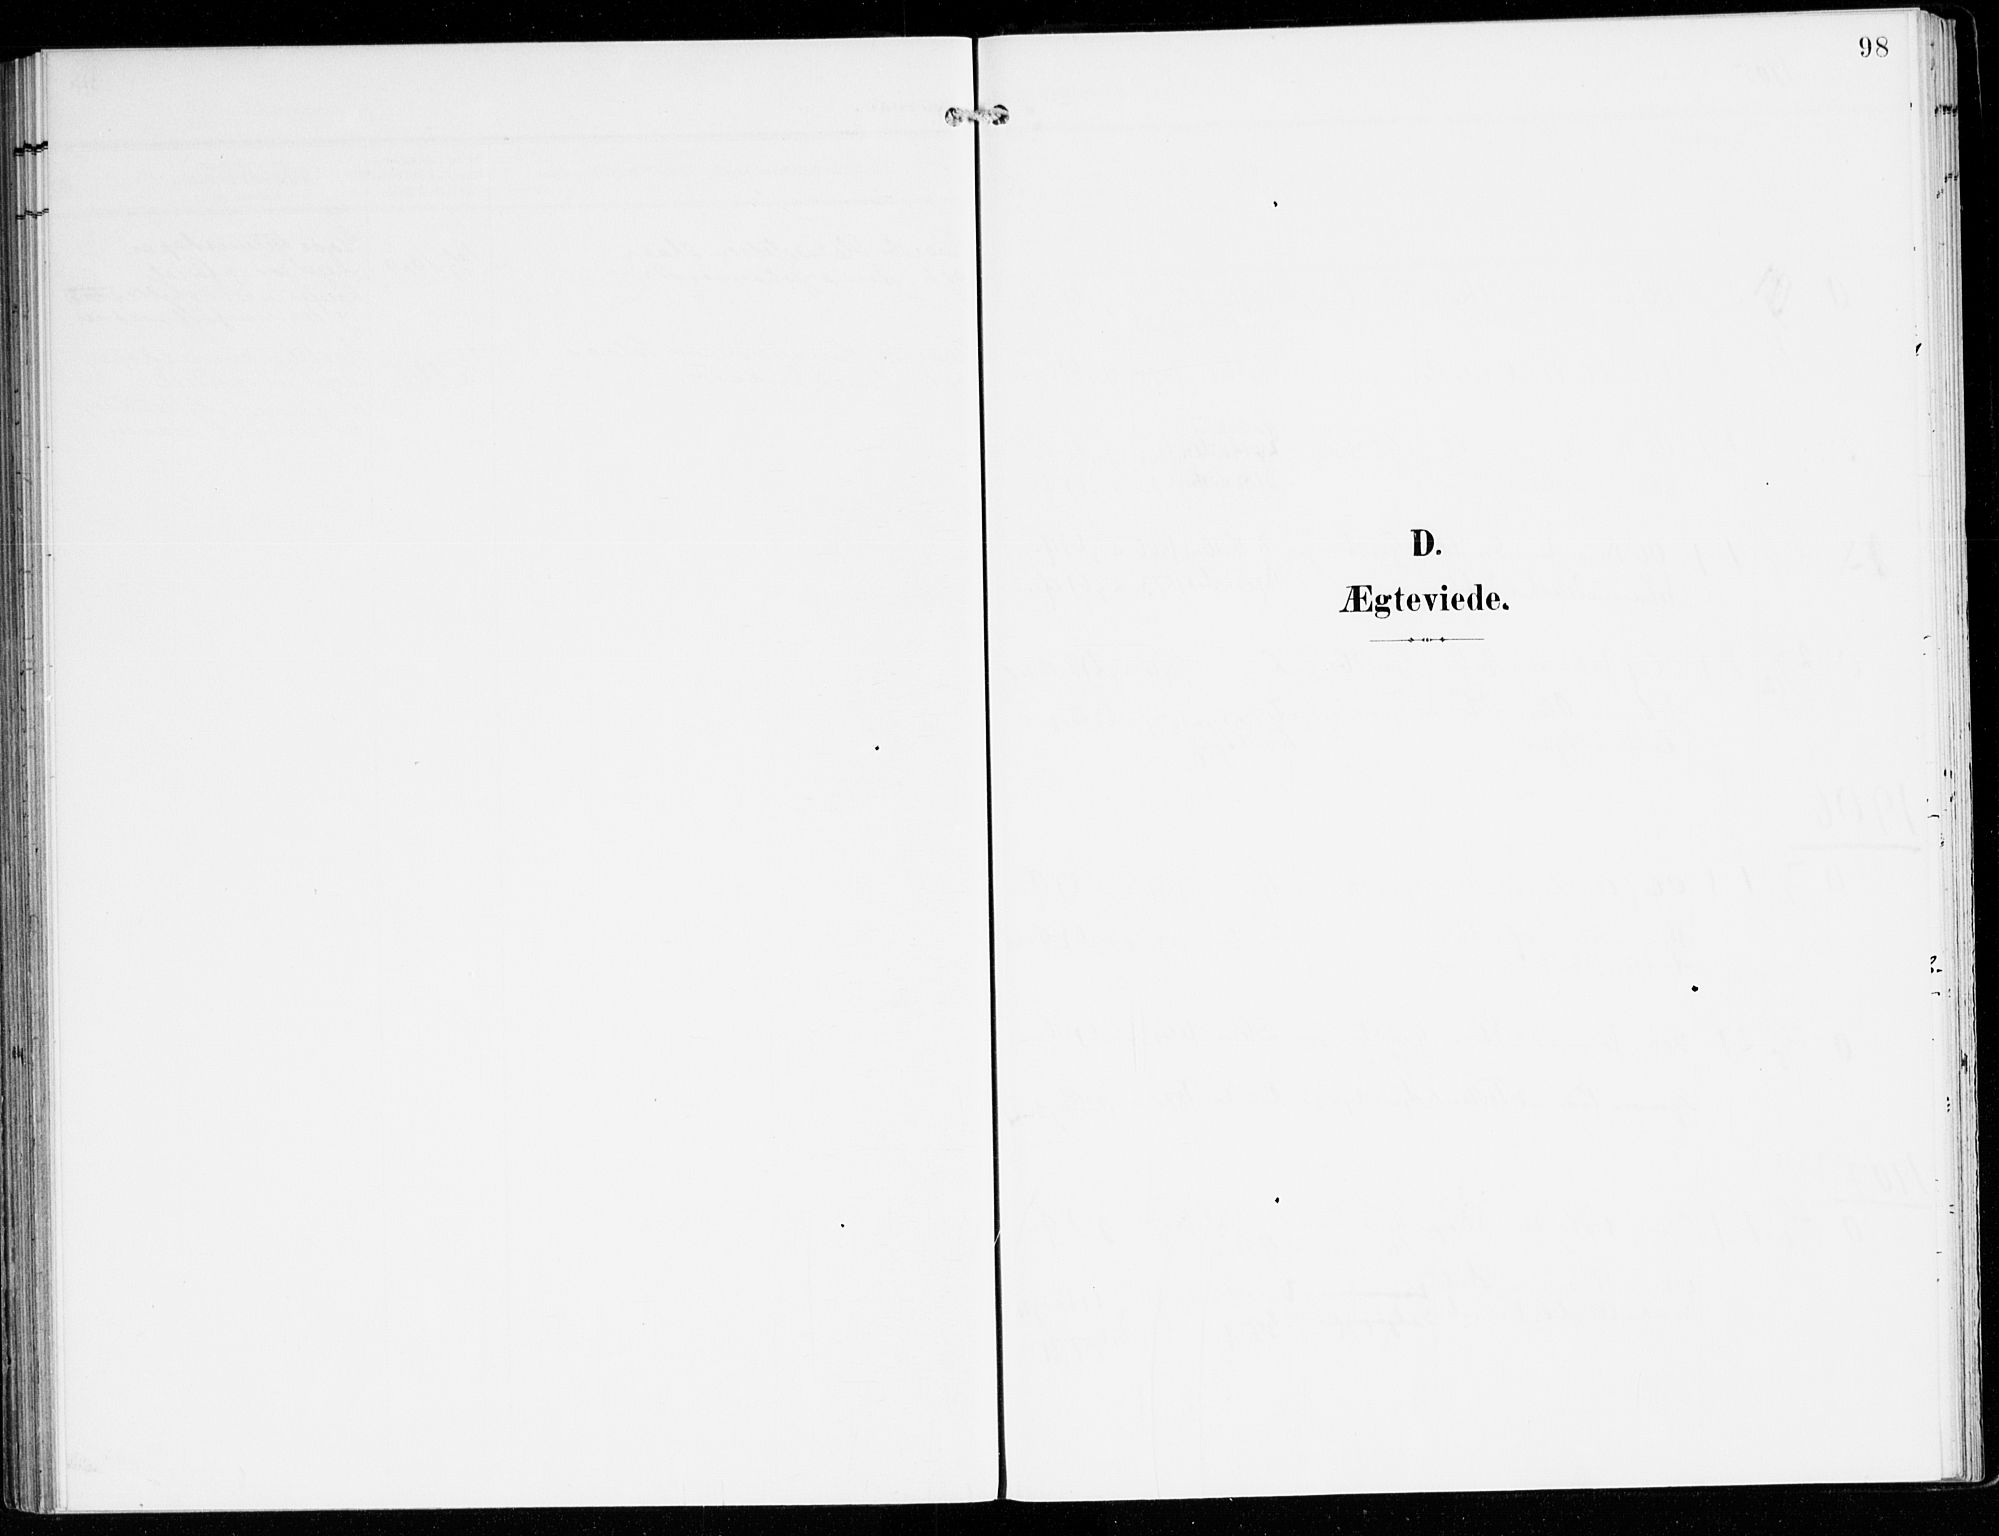 SAB, Hyllestad Sokneprestembete, Ministerialbok nr. D 2, 1905-1919, s. 98